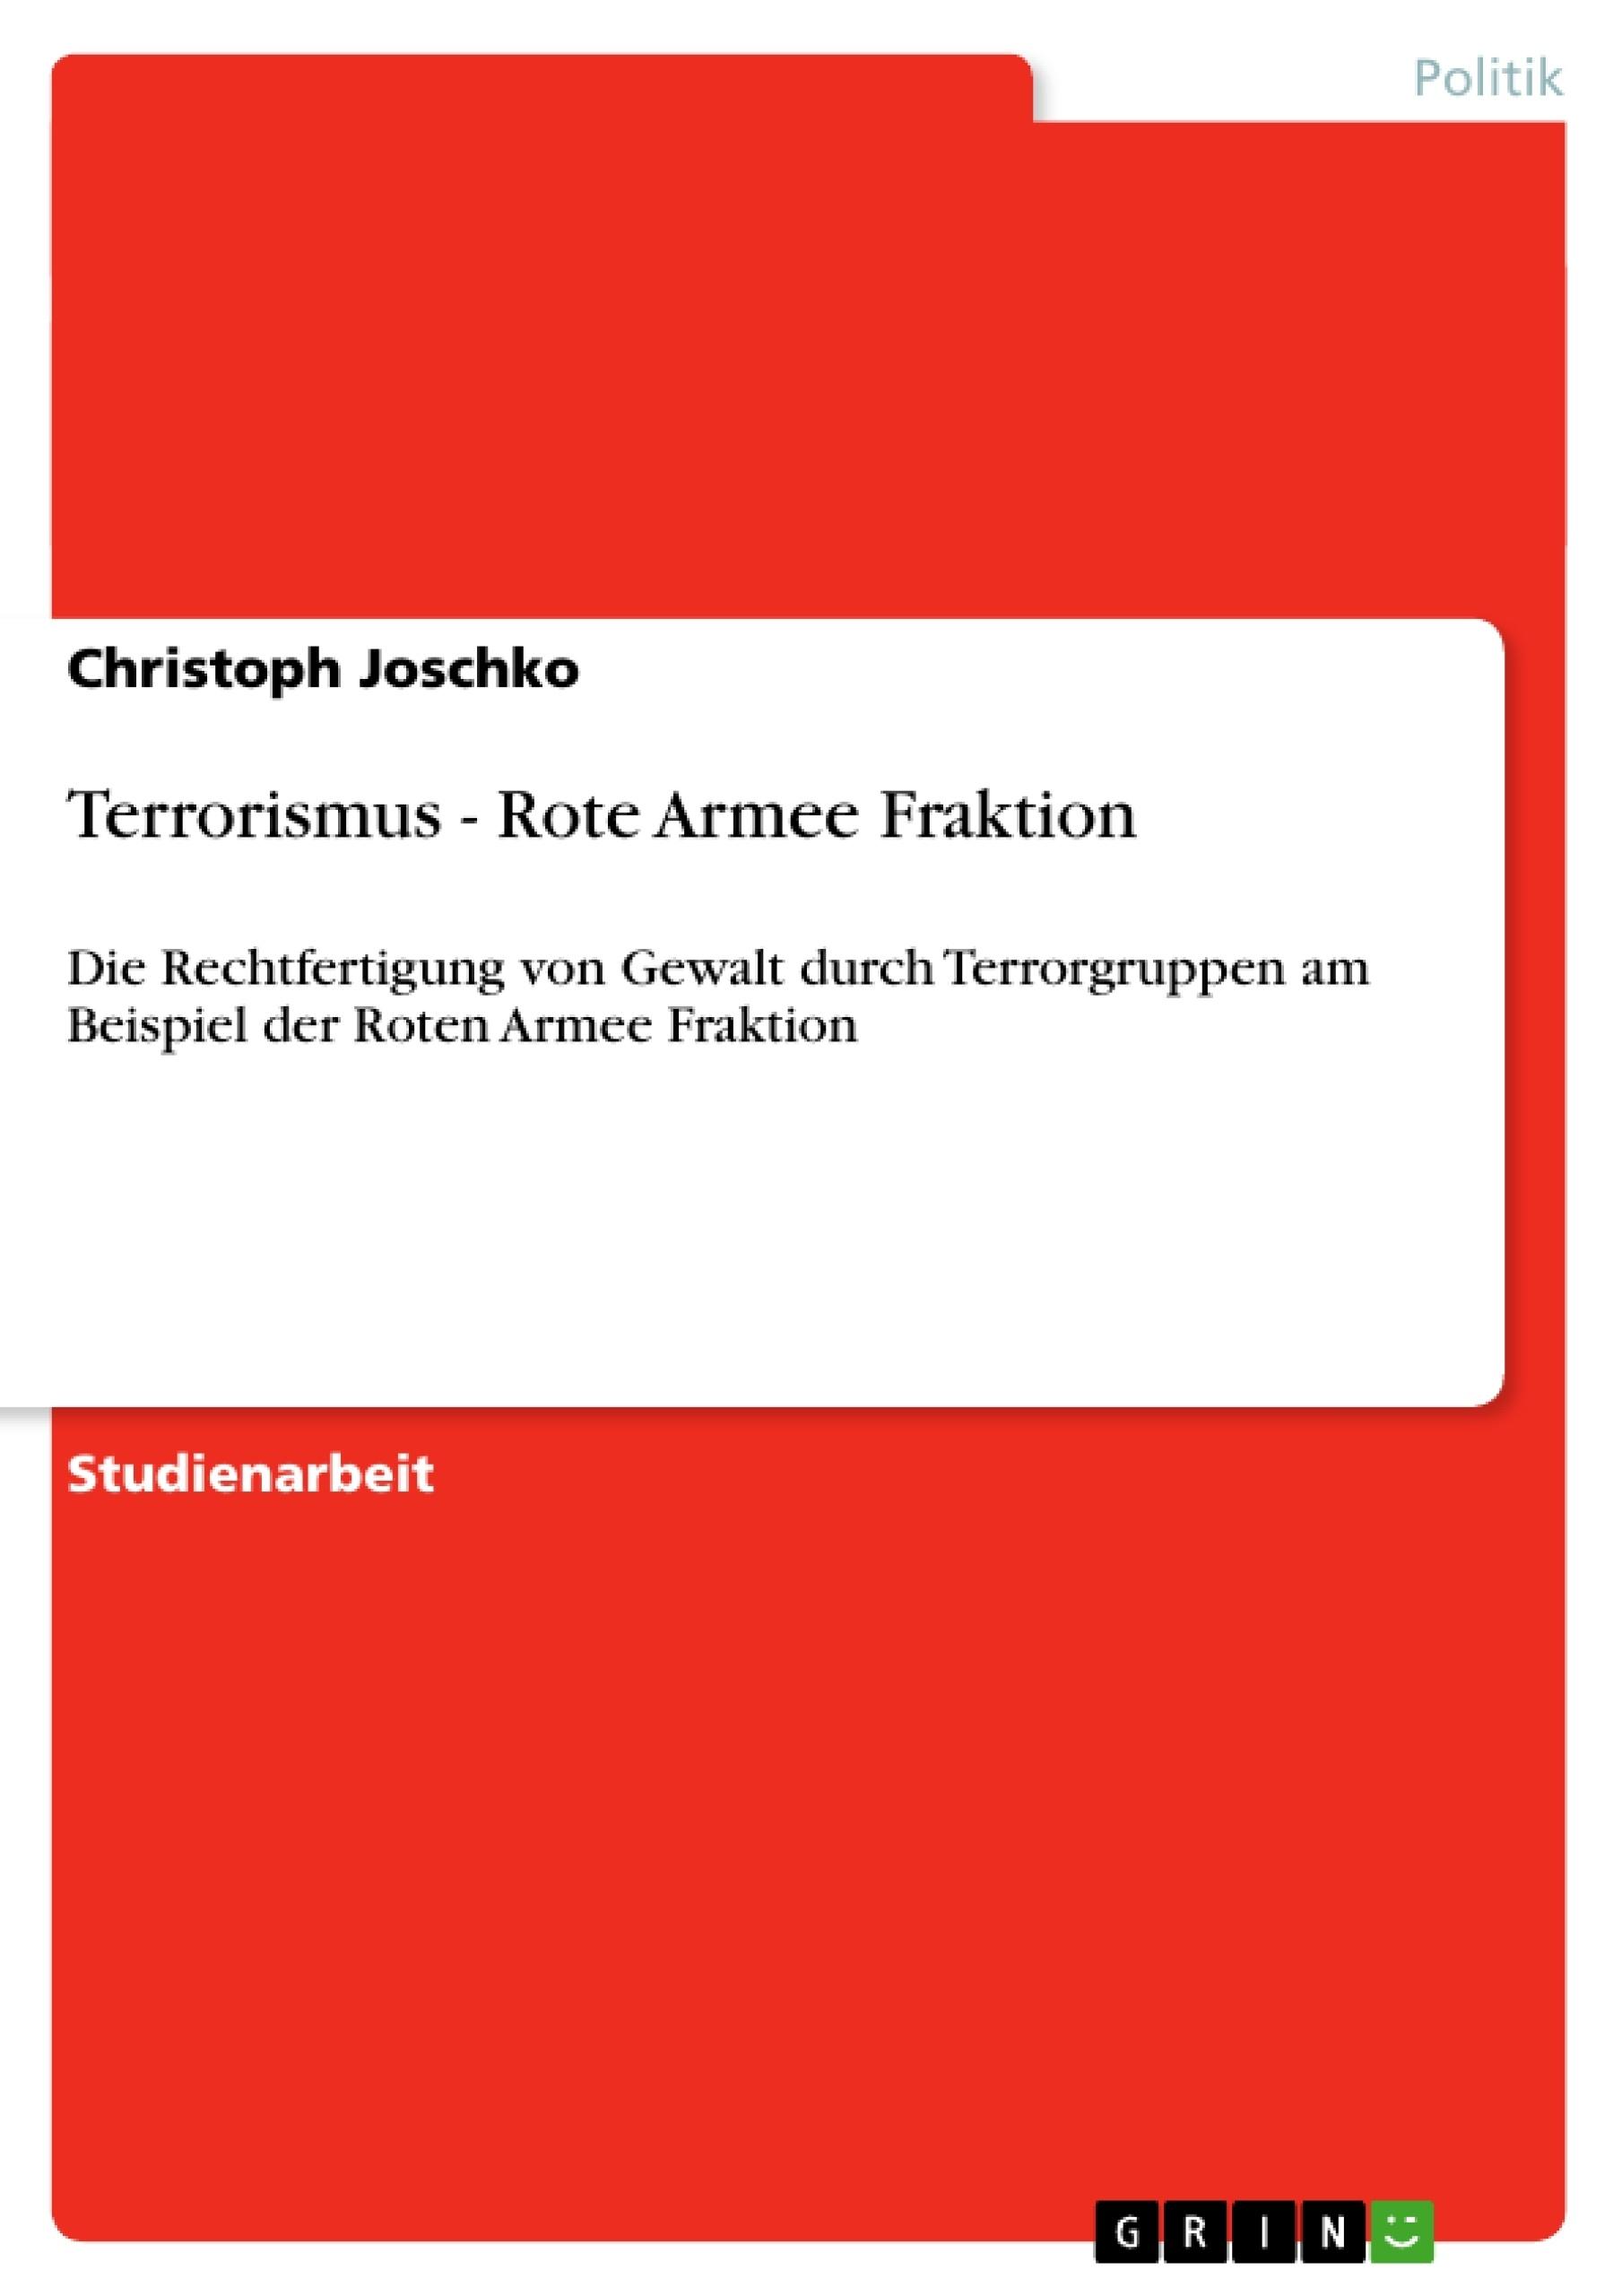 Titel: Terrorismus - Rote Armee Fraktion